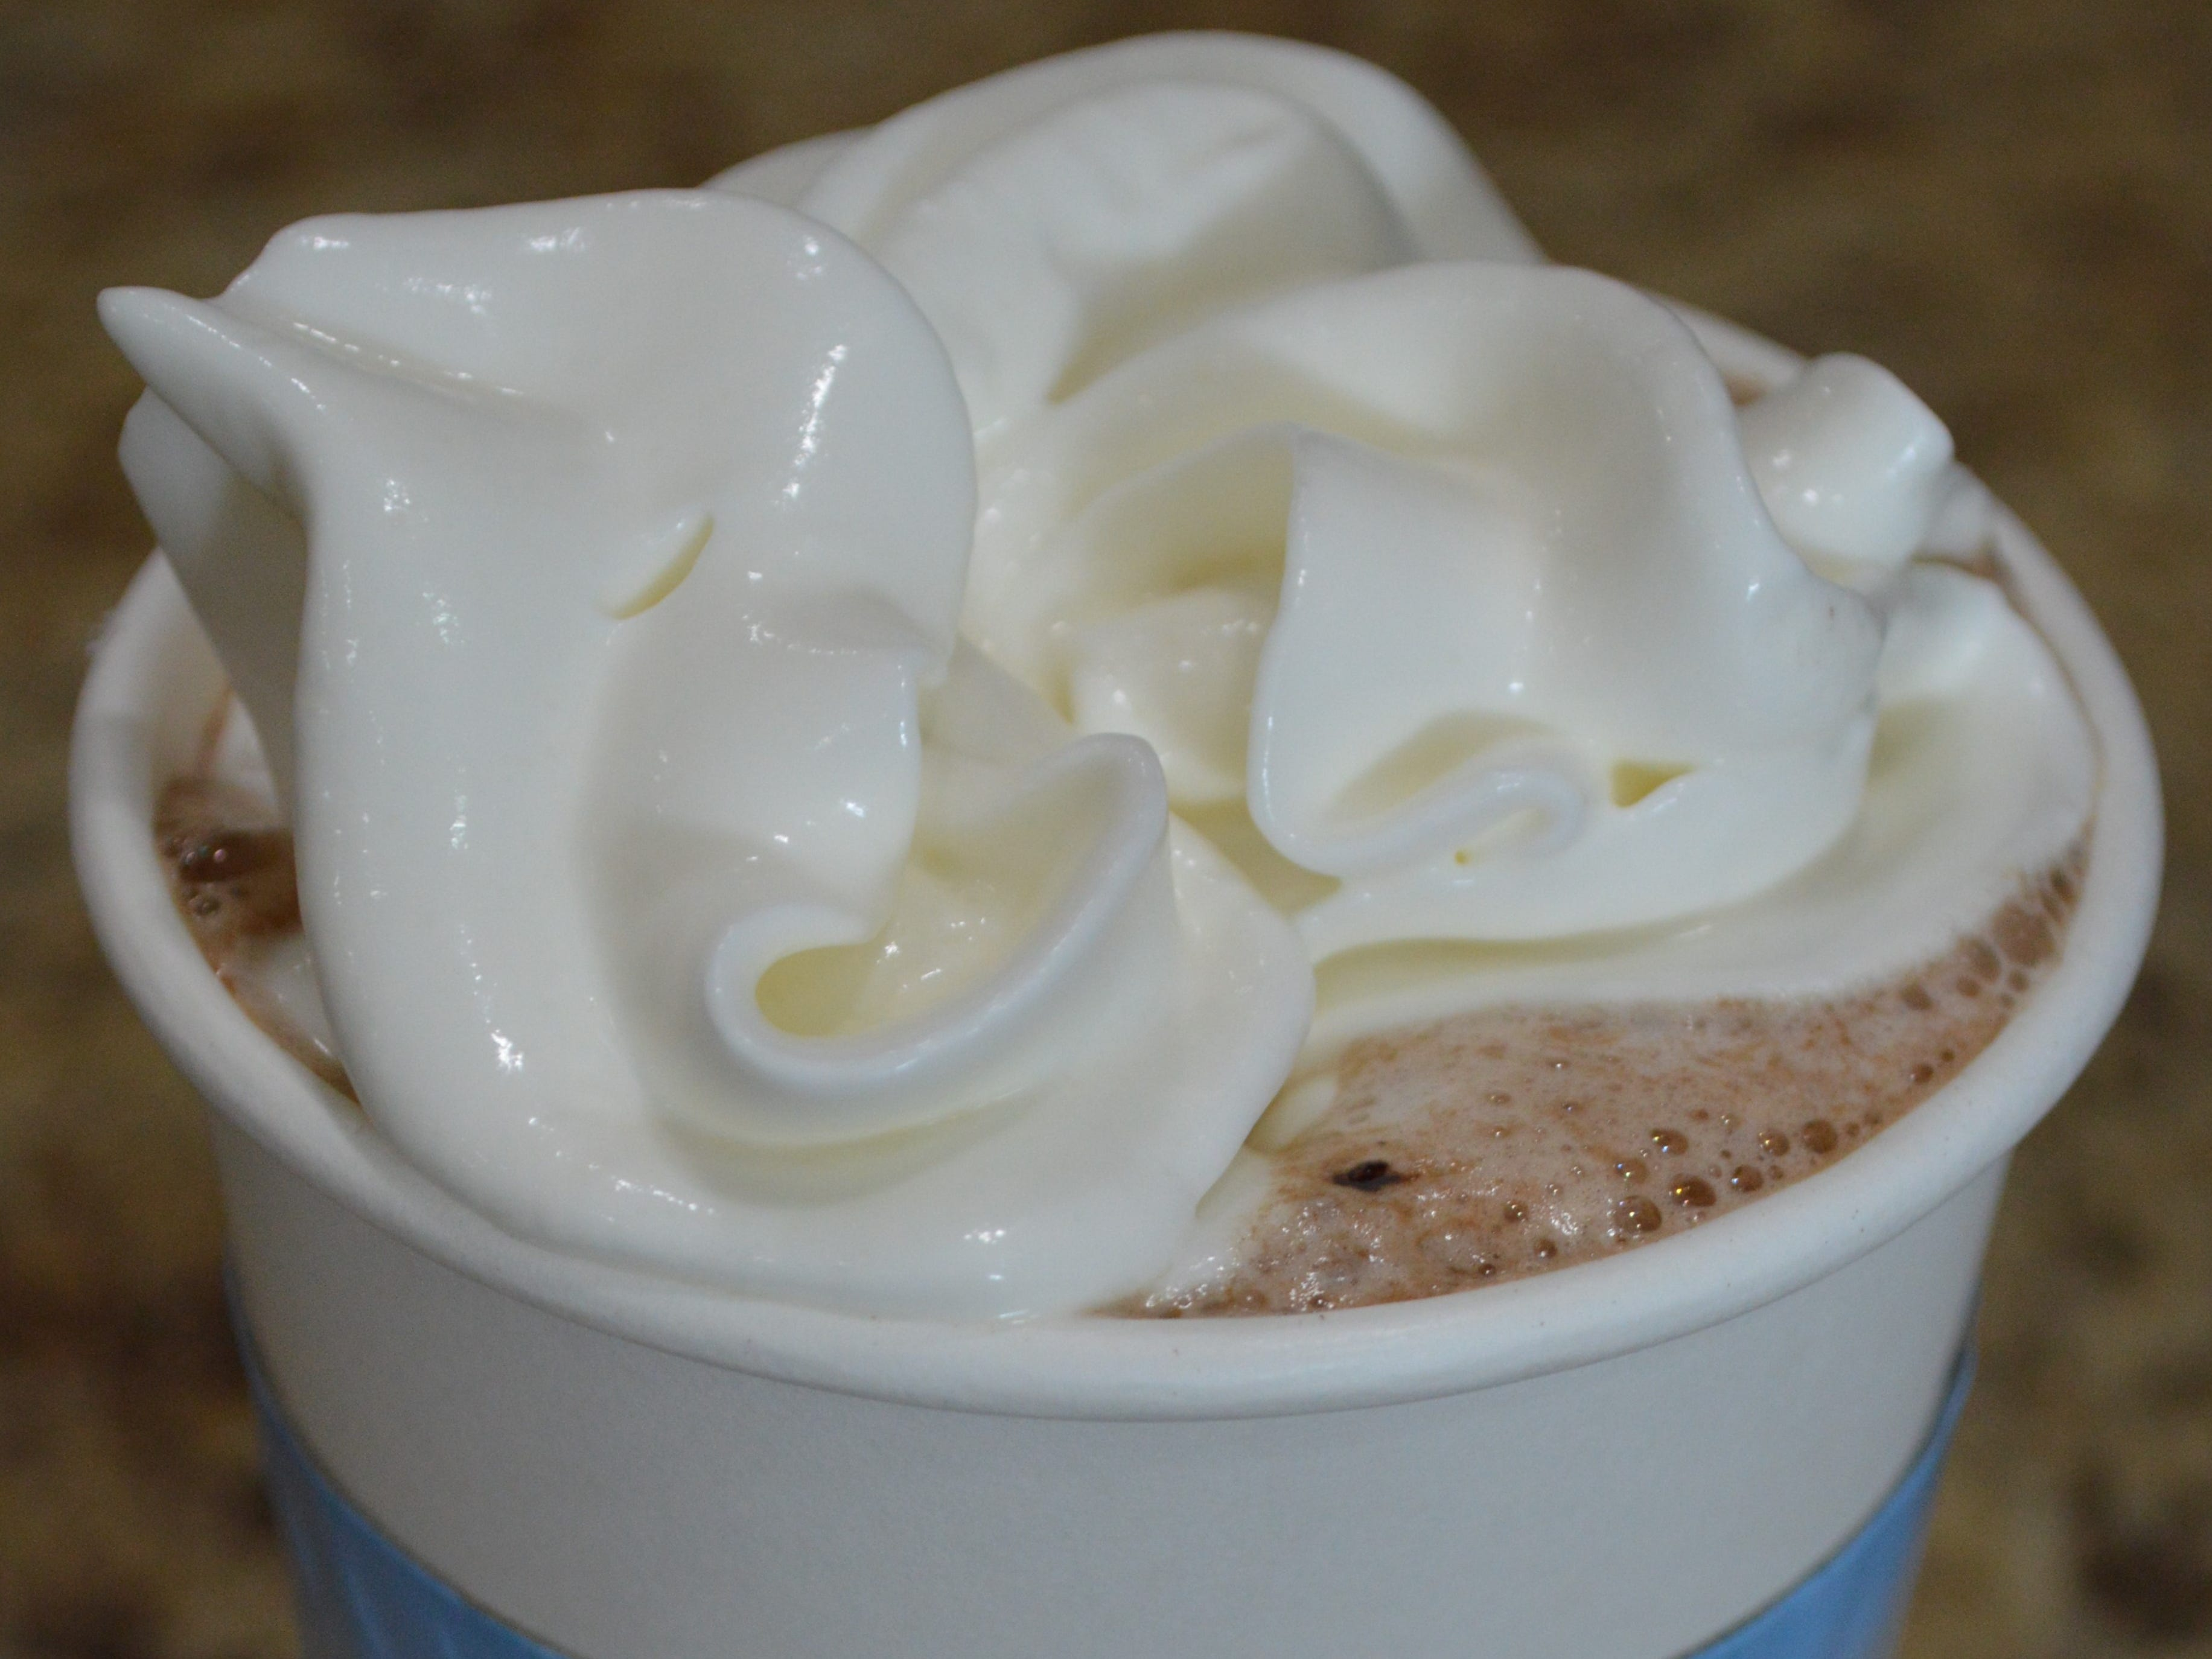 Broad Street Coffee Co. serves hot chocolate made byGhirardelli.